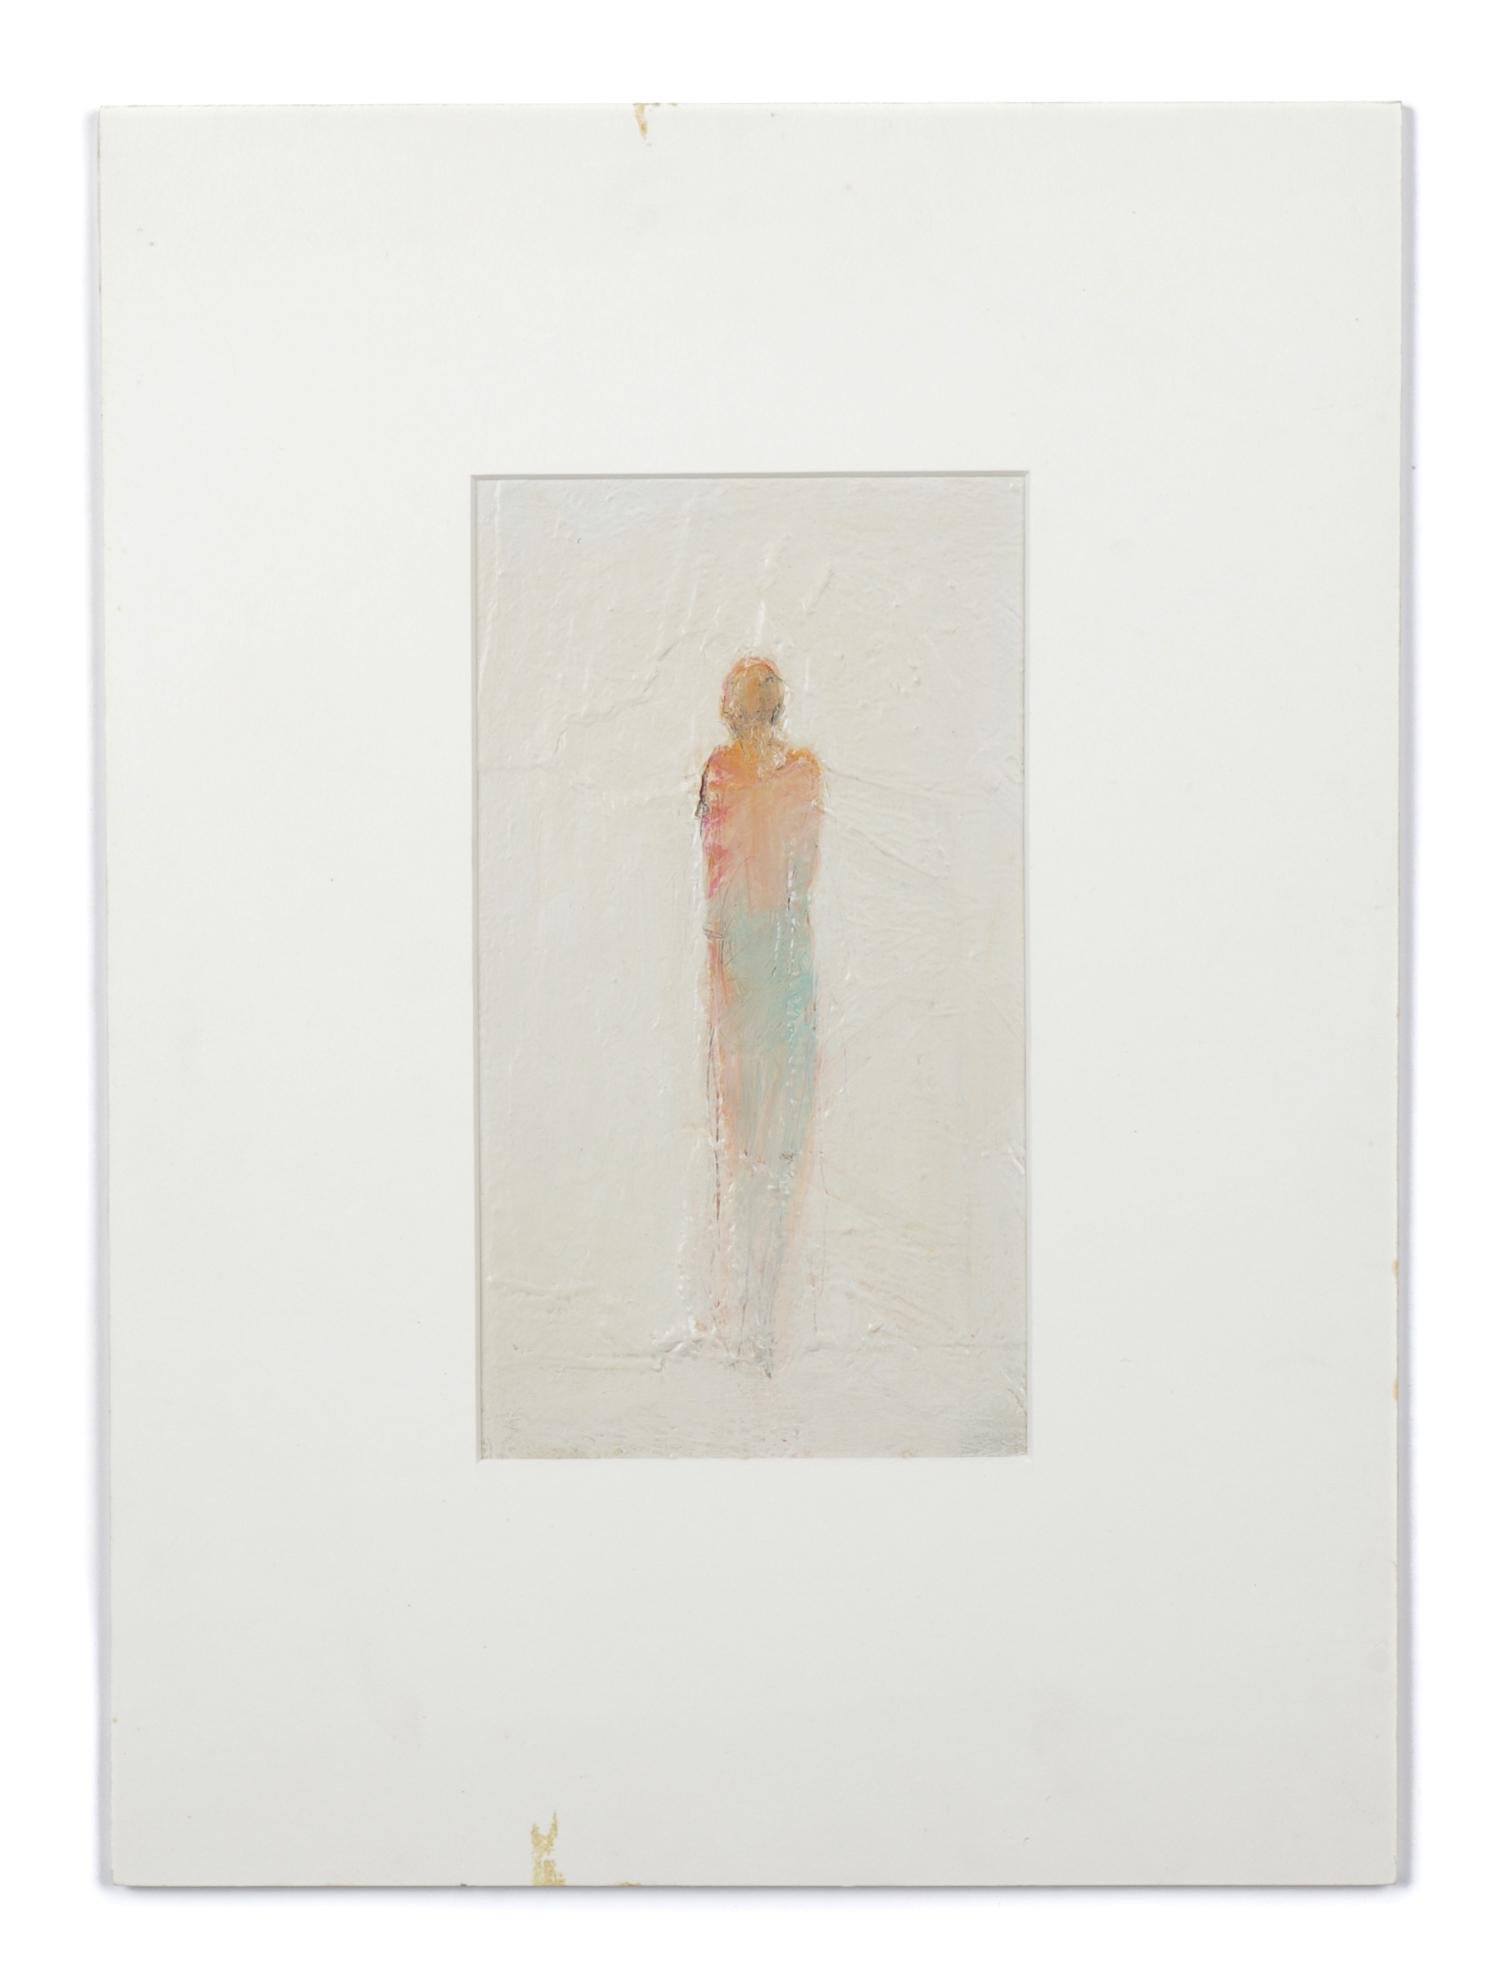 Edward Musante (American, b.1942) Acrylic